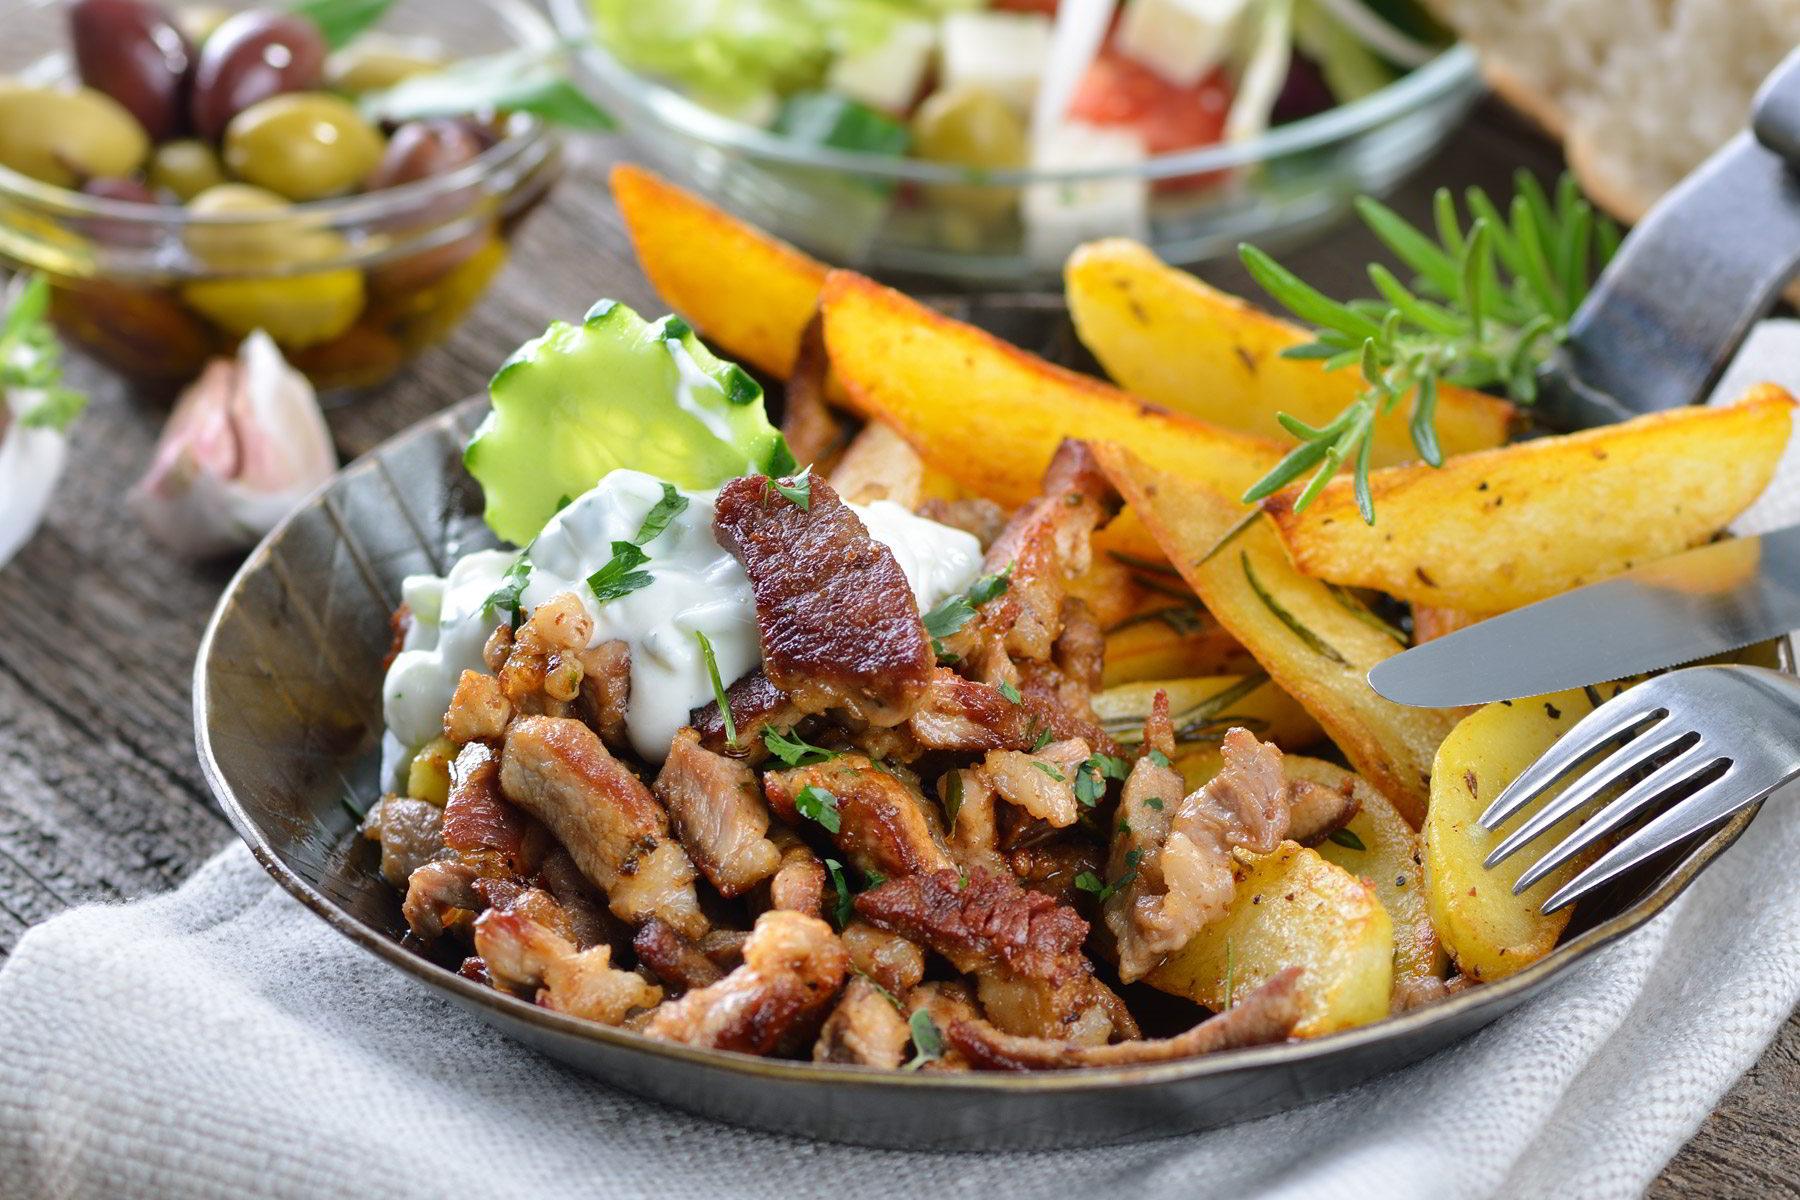 greek-pork-gyros-with-fried-potatoes-and-sauce